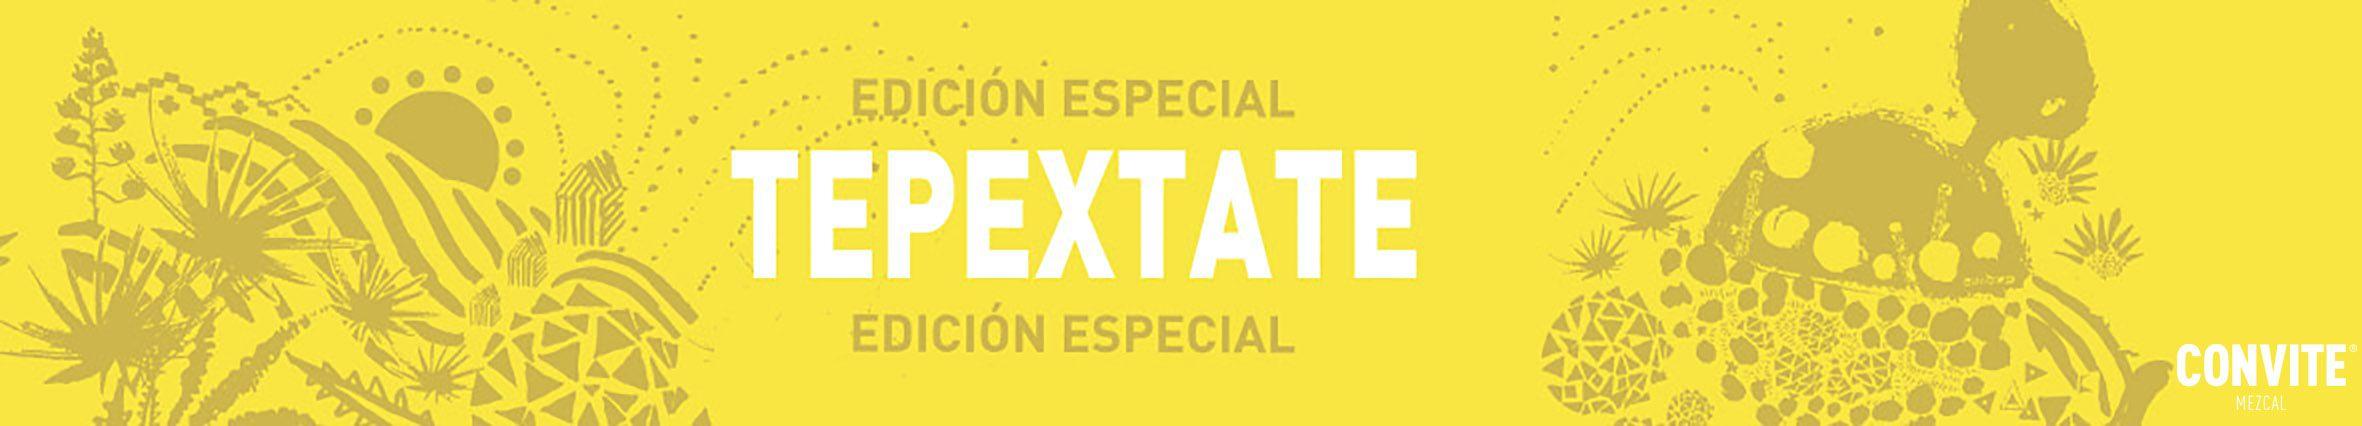 "Mezcal de Agave Tepextate. Distintivo de Mezcal Convite ""Tepextate""."